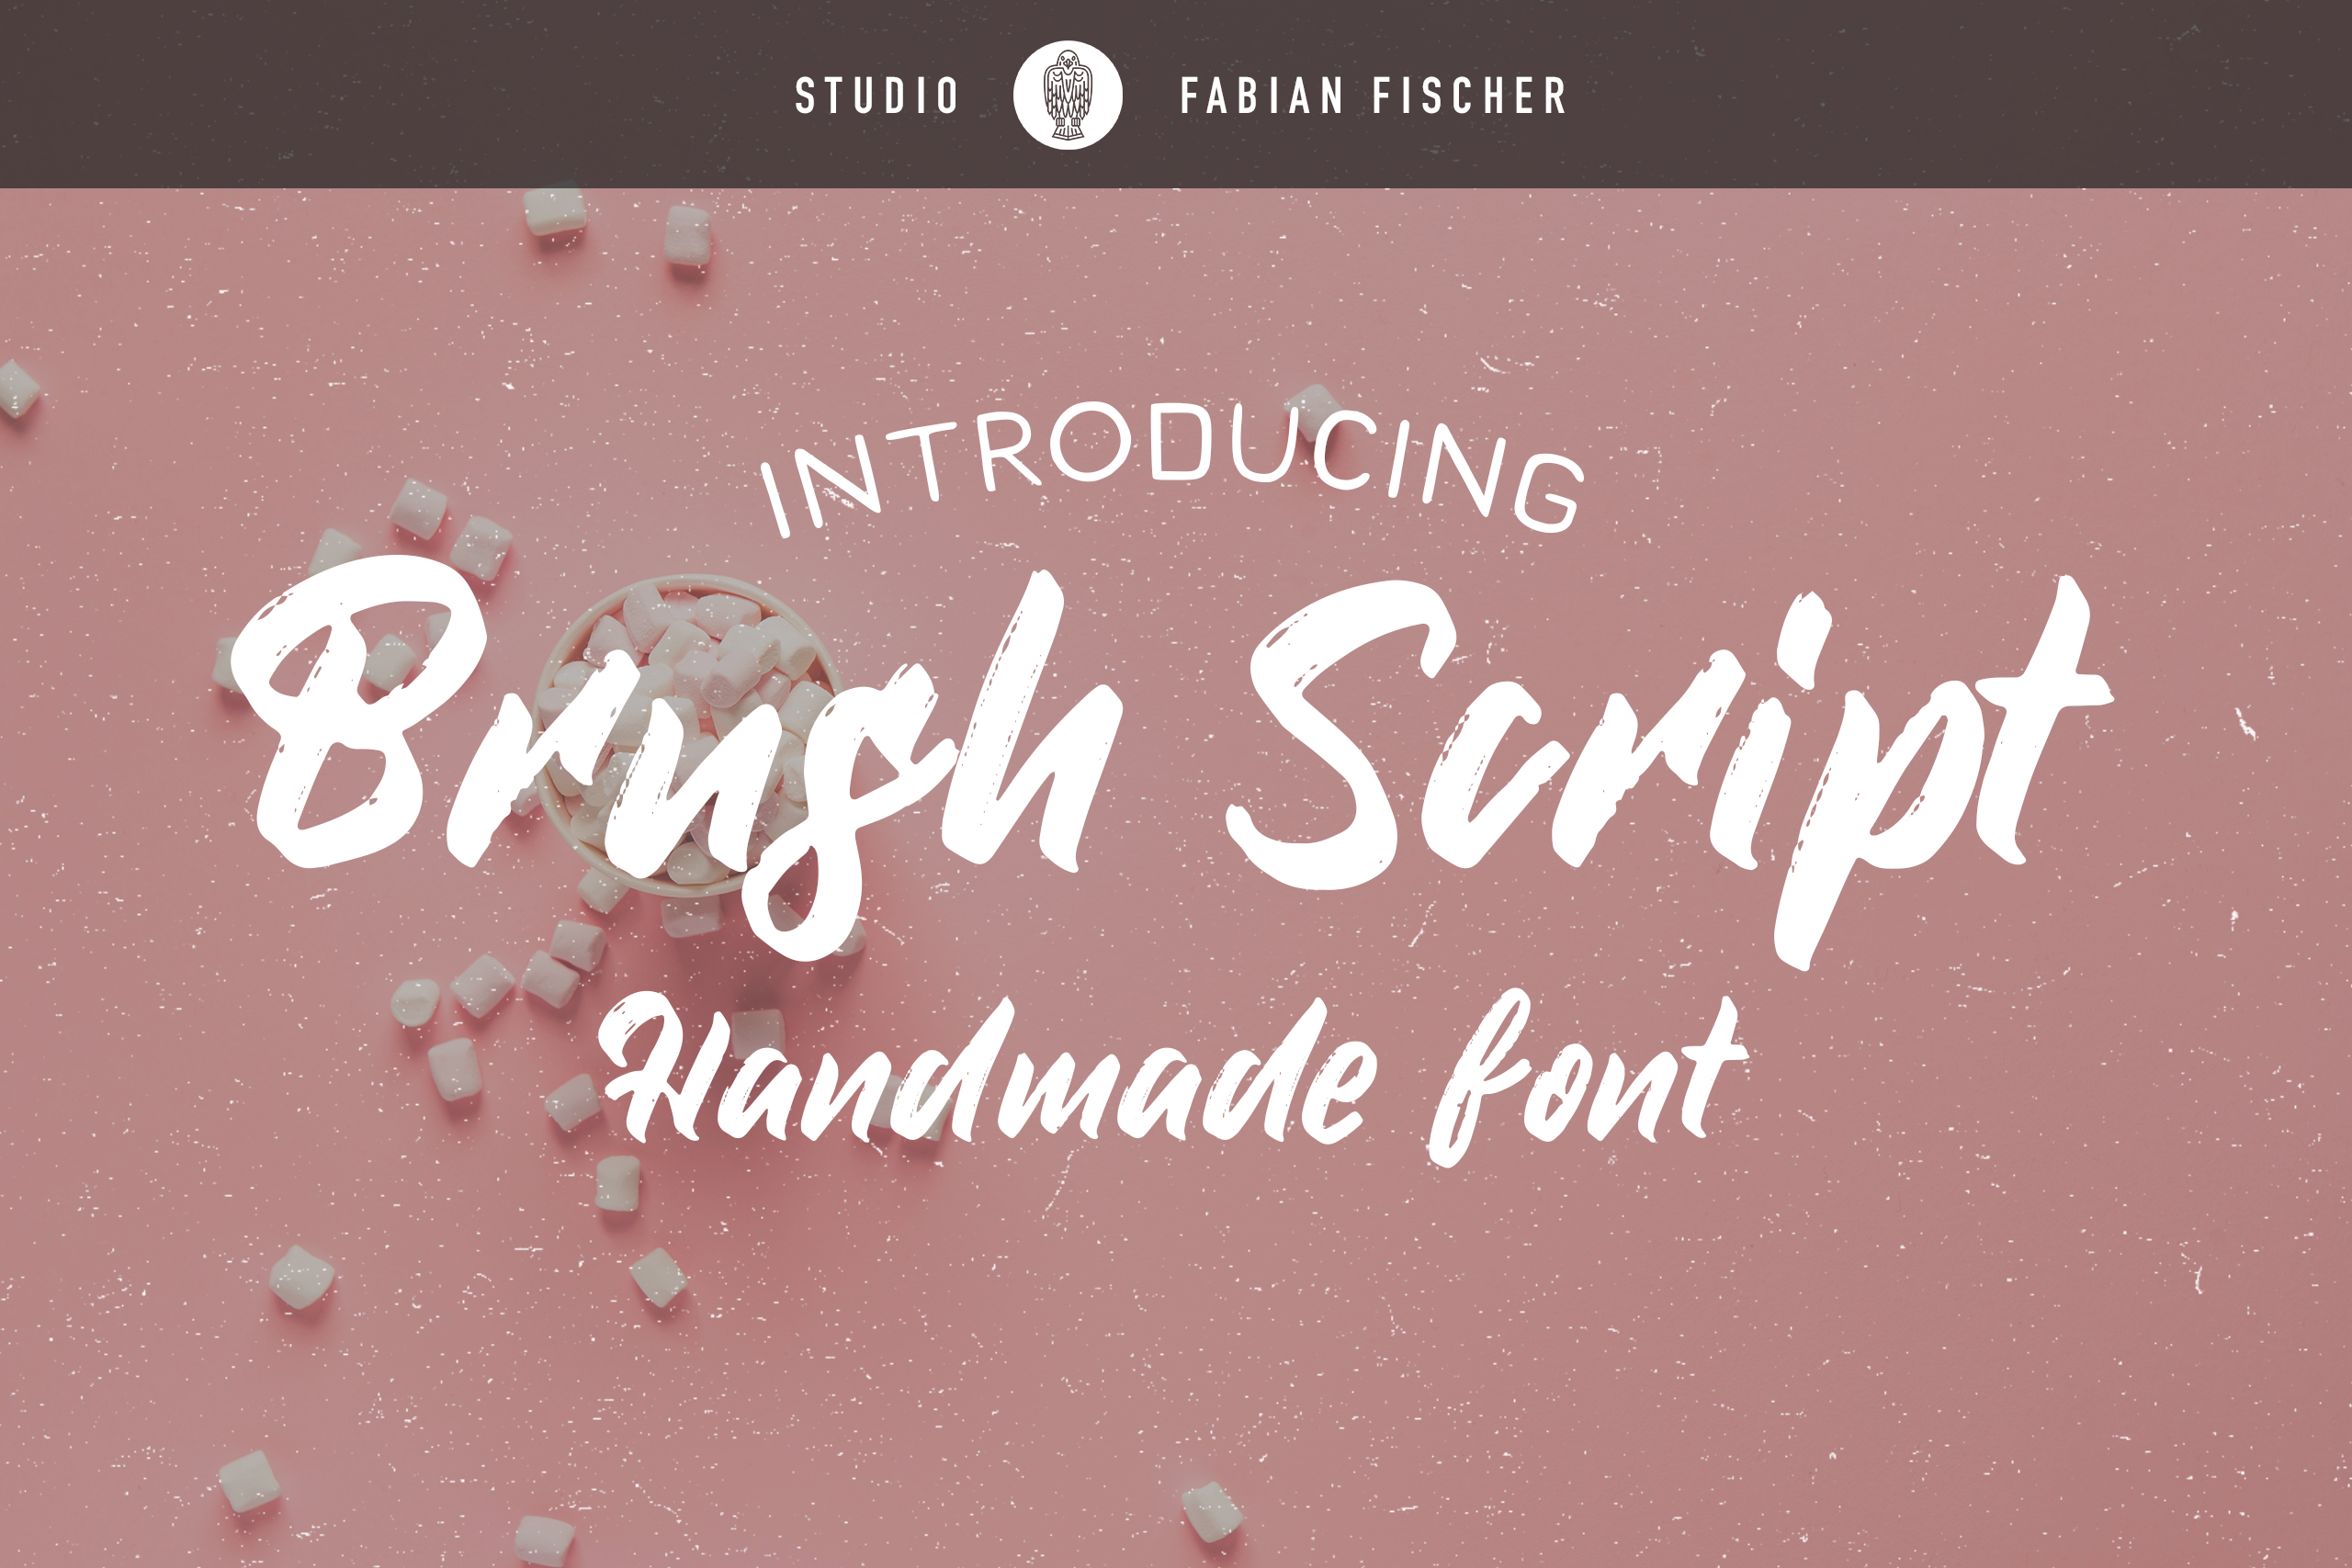 Brush Script - Handmade font example image 1